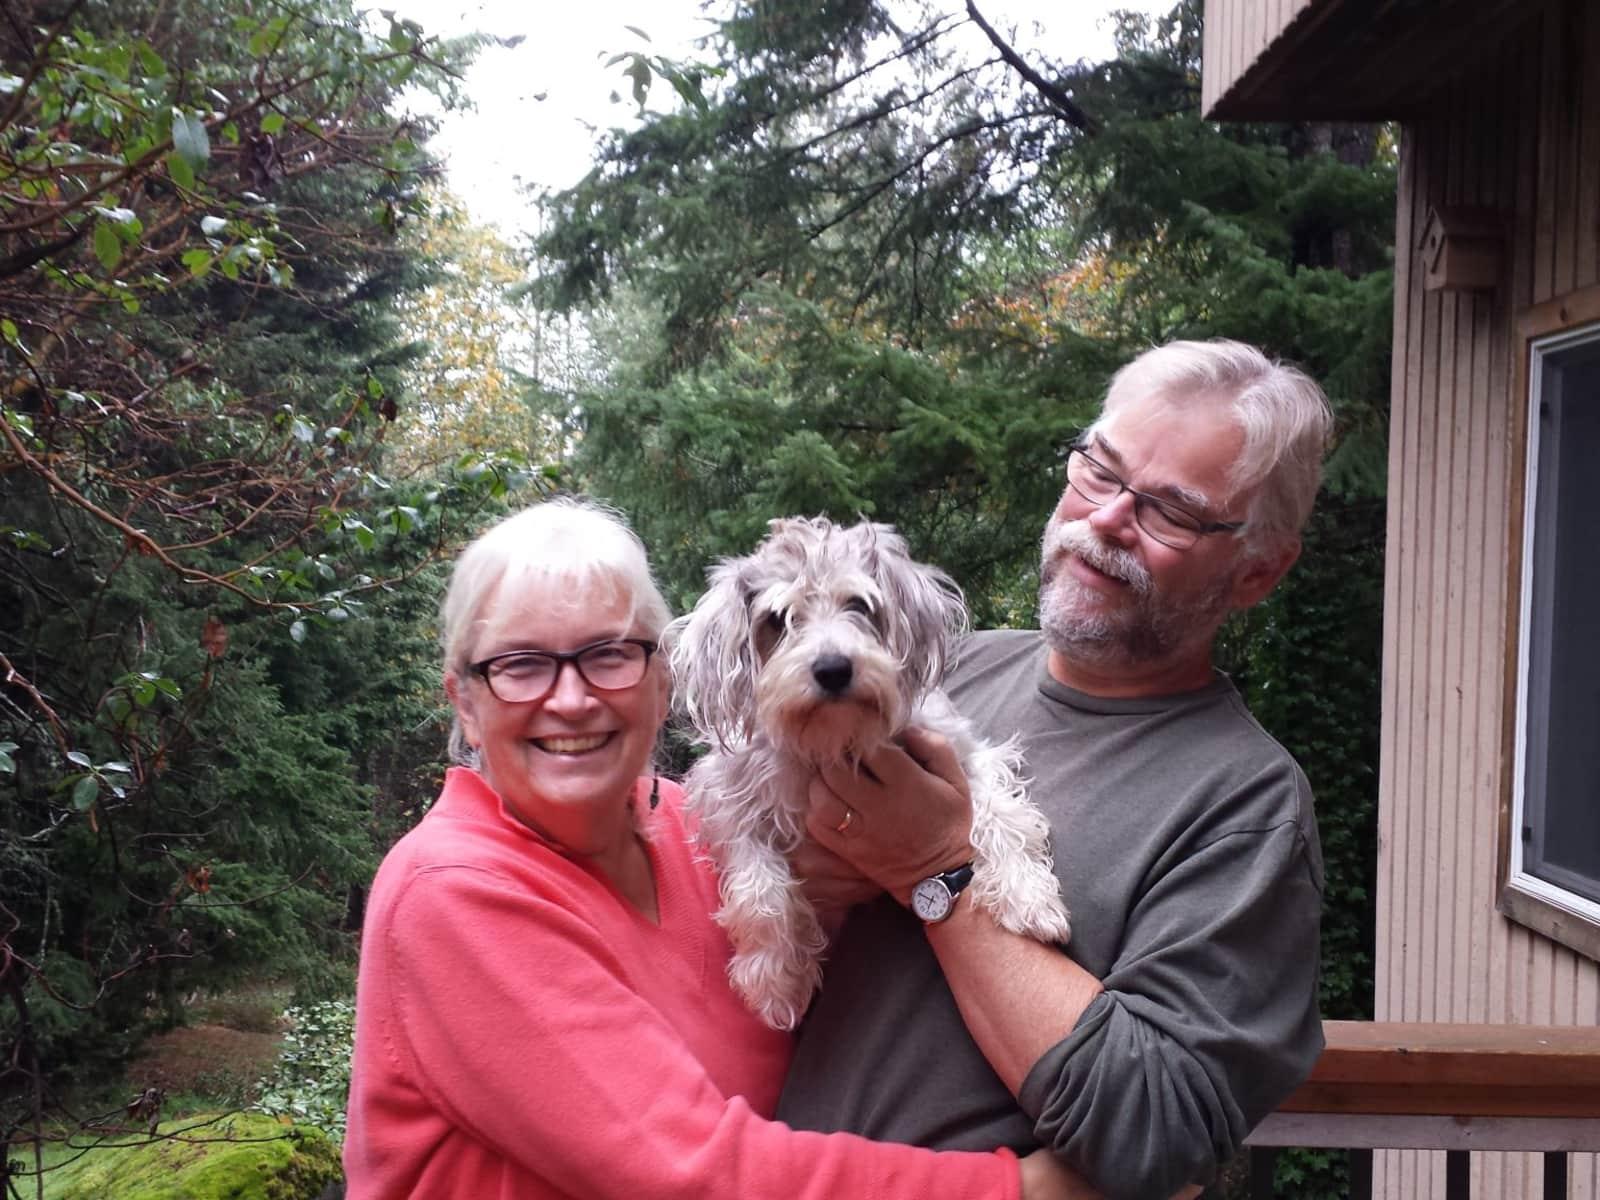 Sonja & Norman from Victoria, British Columbia, Canada